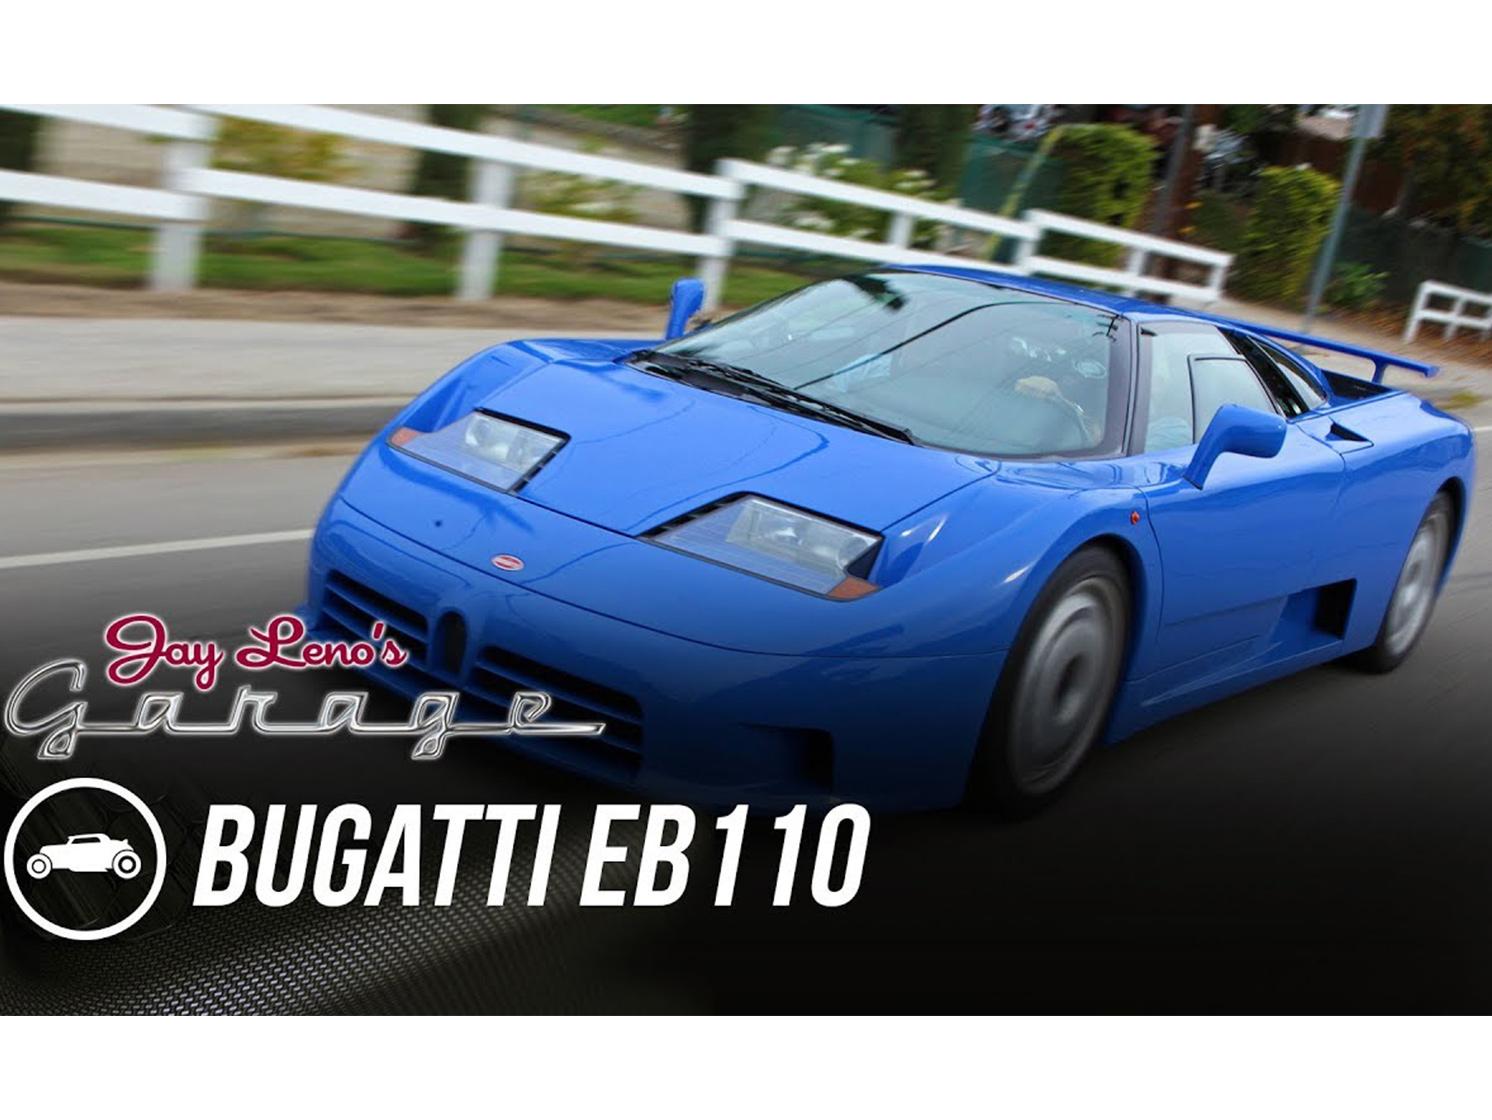 The Bugatti EB110 is a quirky, fantastic '90s supercar thumbnail